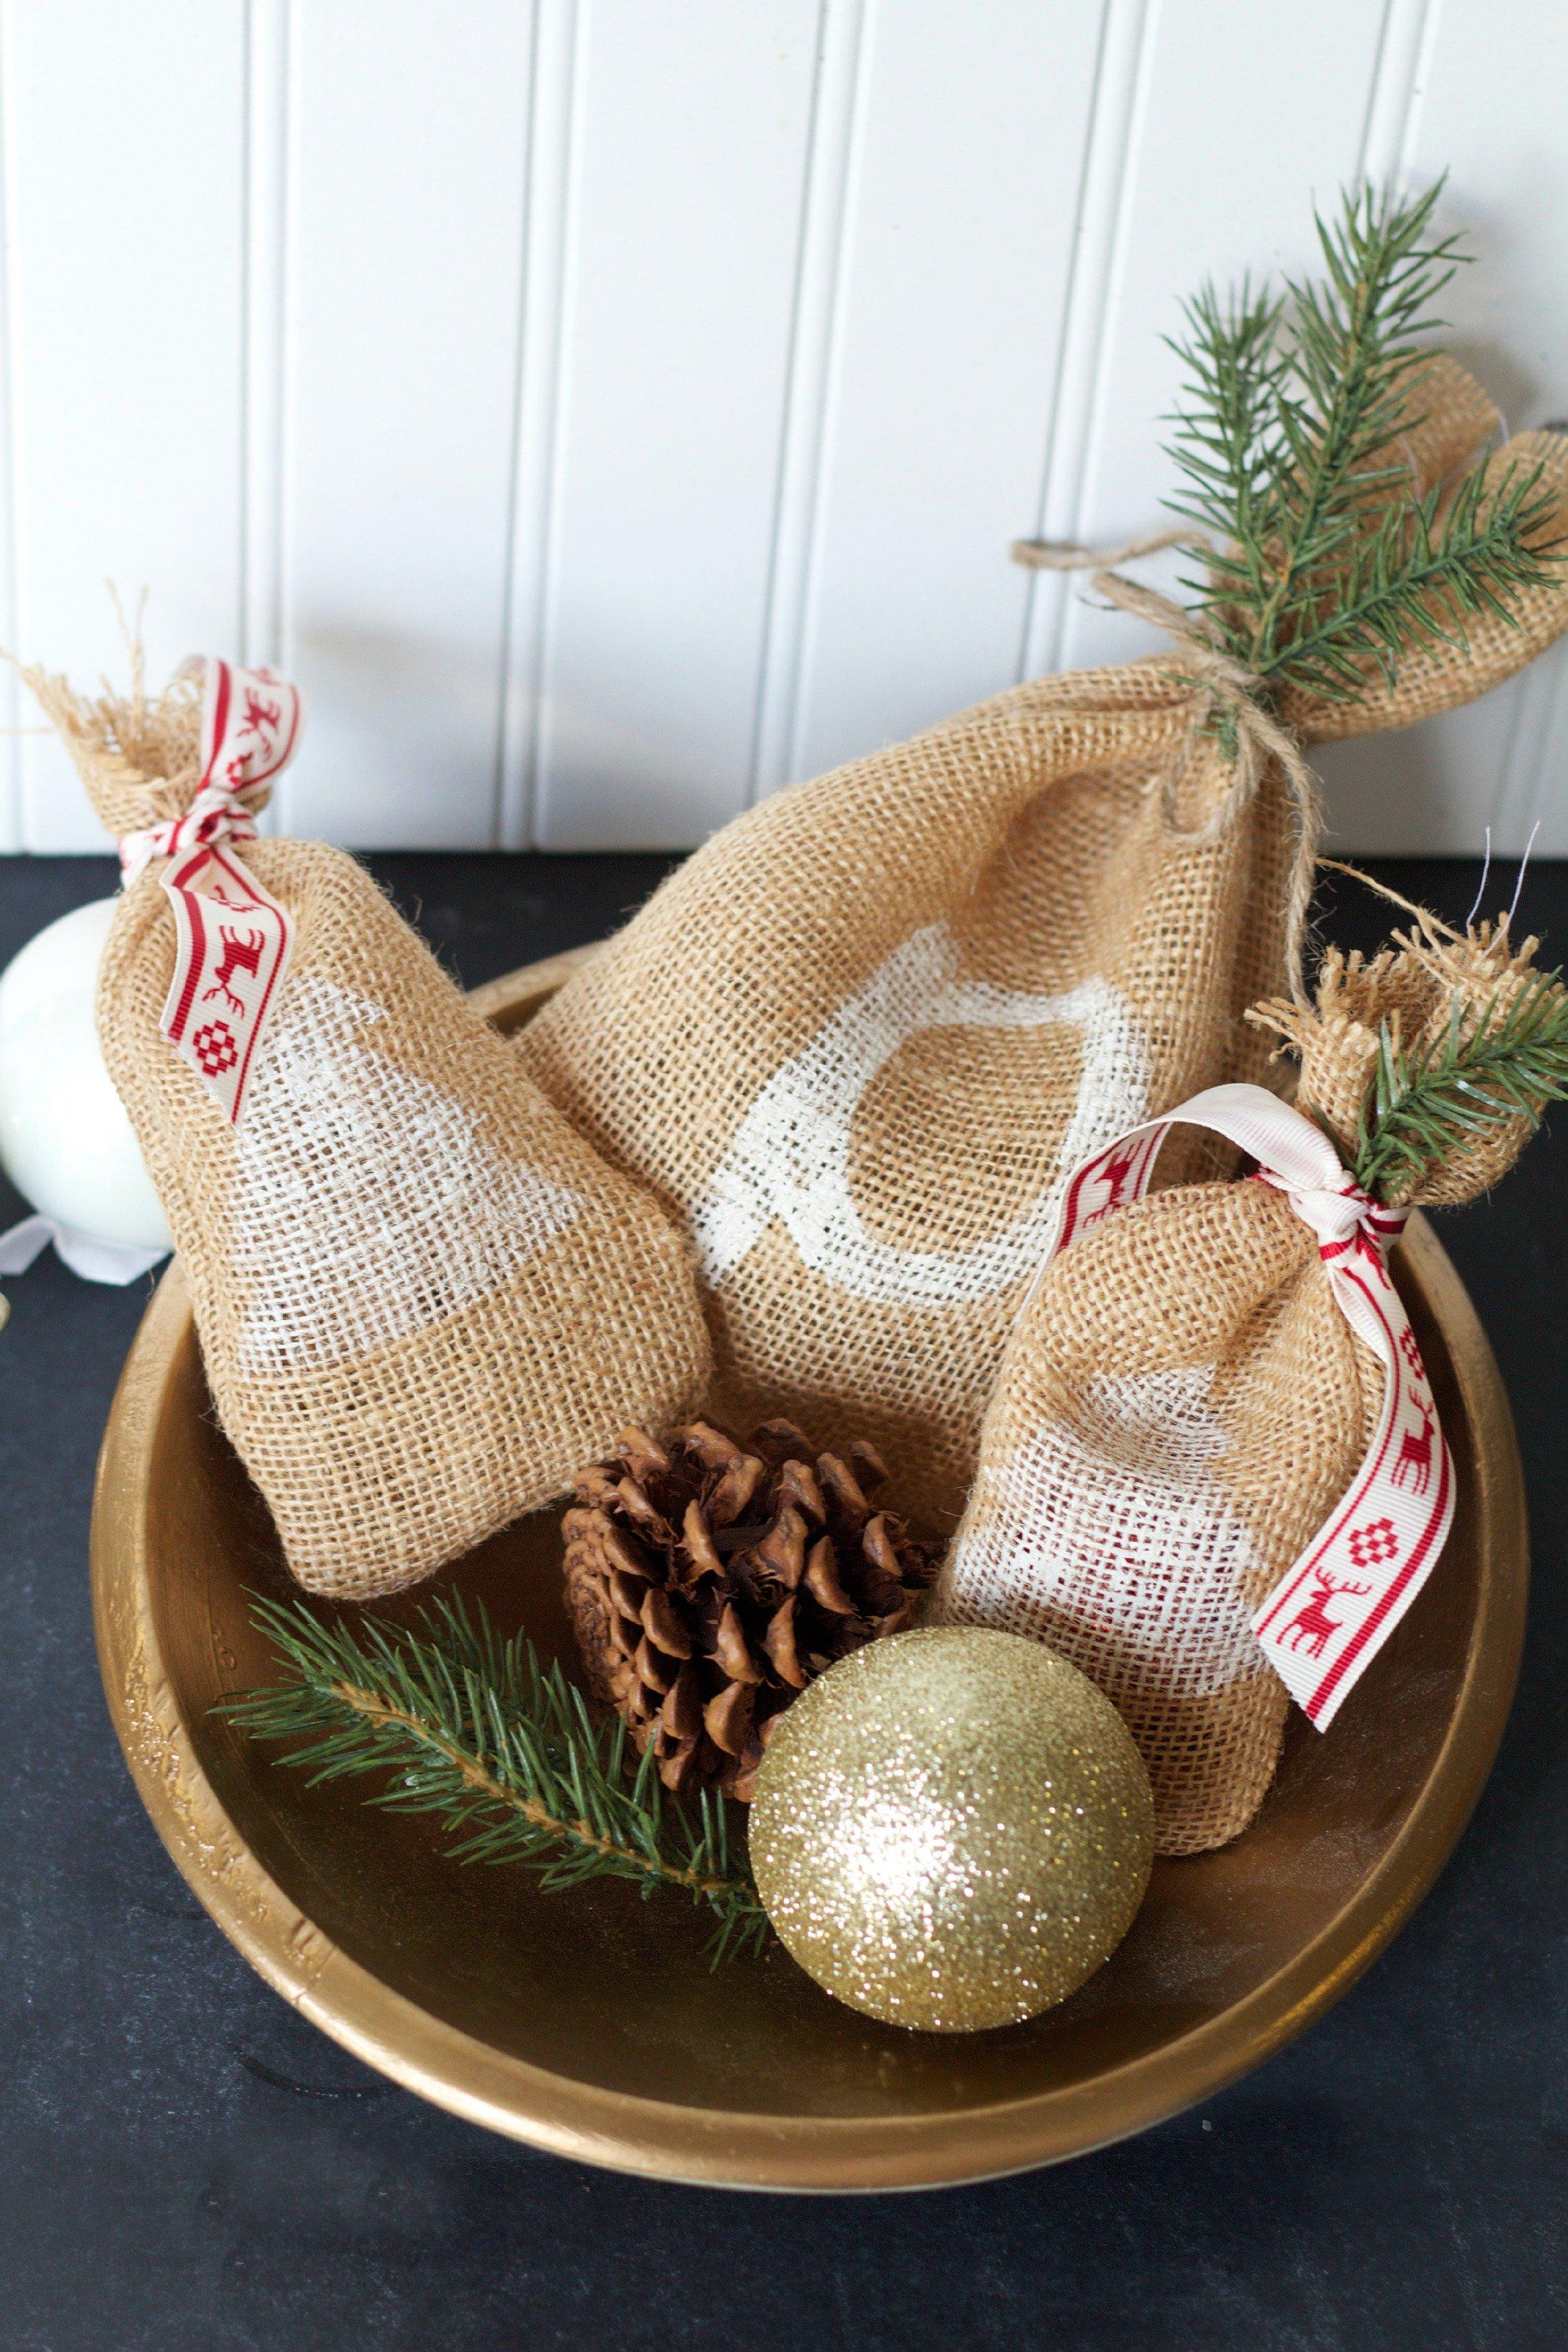 Burlap Gift Bags DIY Holiday Gift Bags